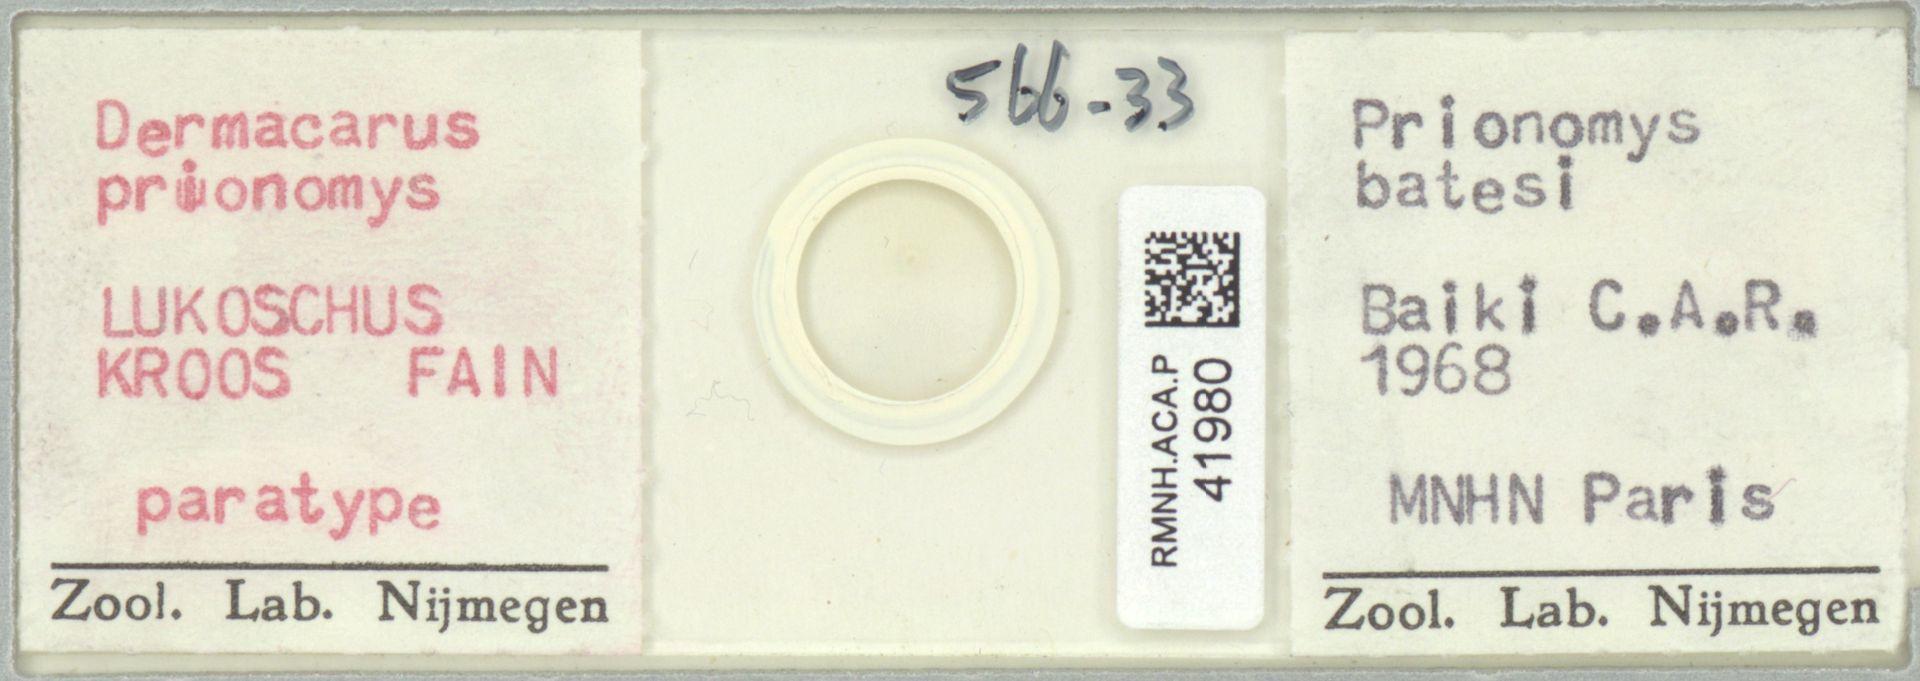 RMNH.ACA.P.41980 | Dermacarus prionomys Lukoschus, Kroos, Fain